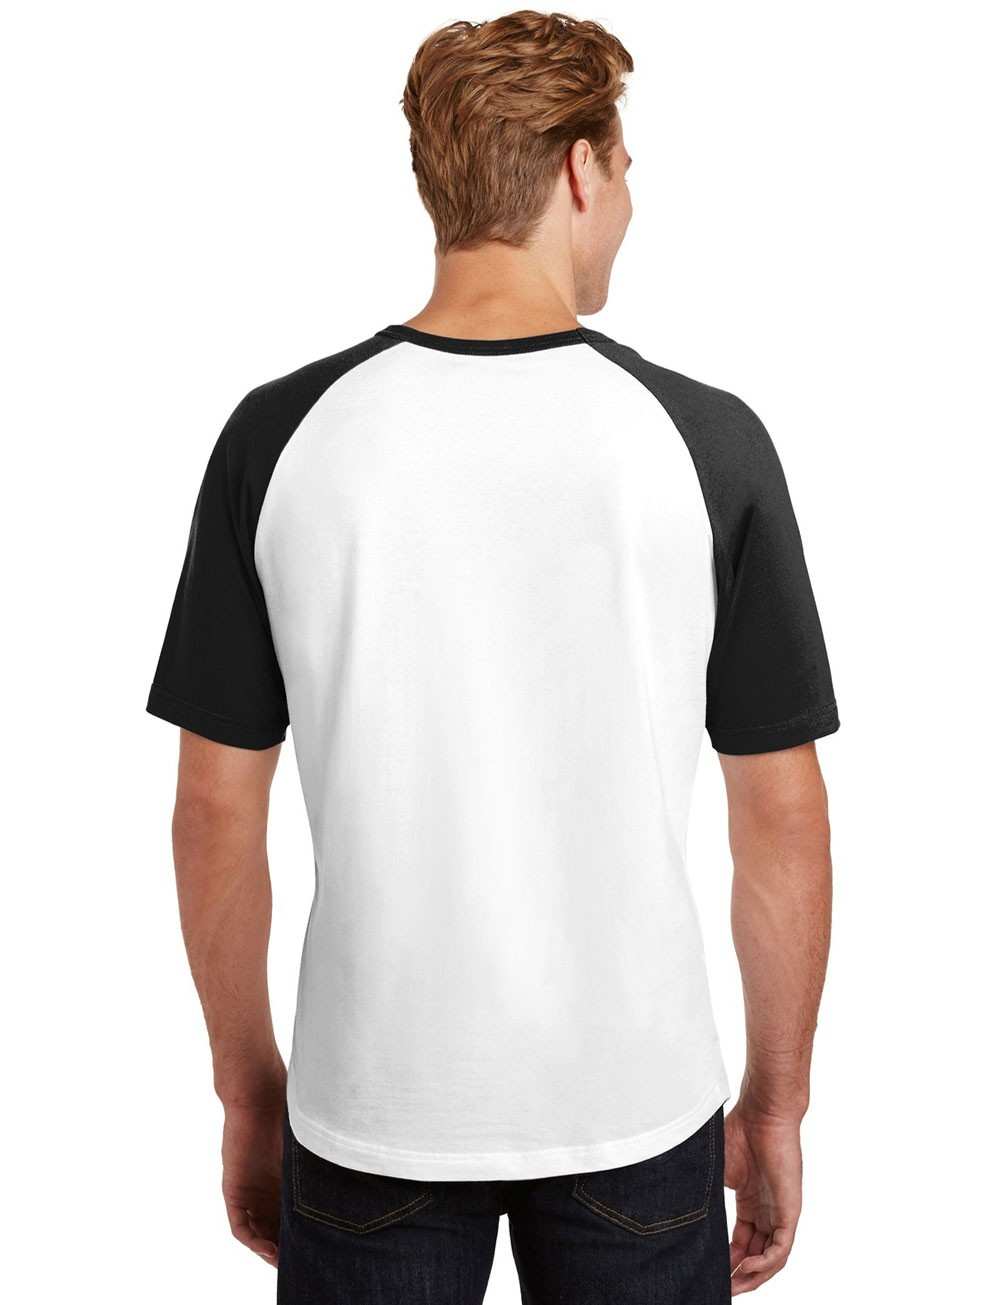 Camiseta Raglan Masculina Guns n' Roses Caricatura ES_199